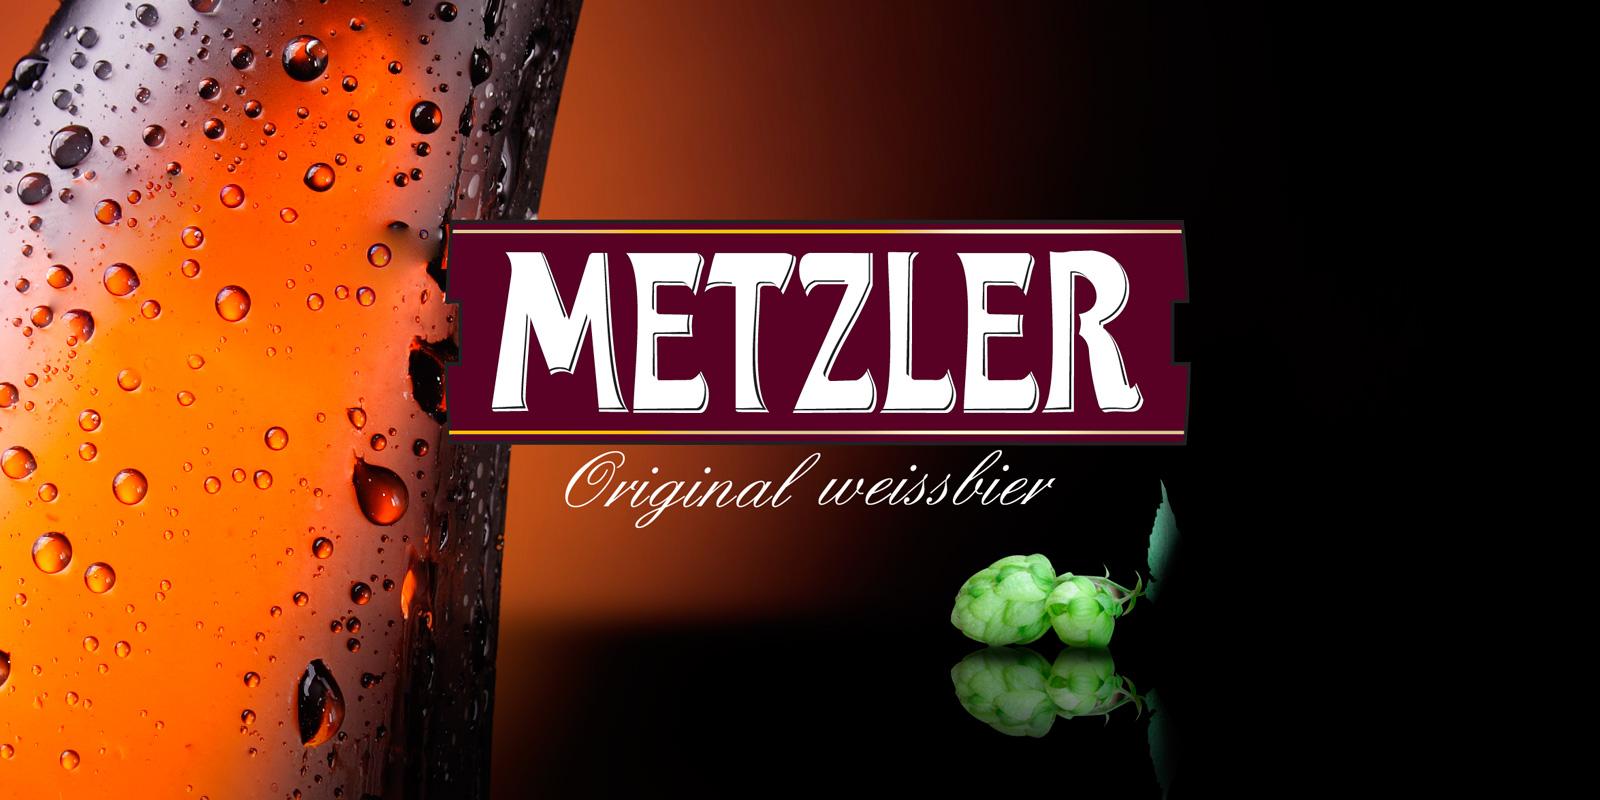 TM «Metzler»;;;;;;Разработка логотипа (пиво);;;;;;<span>Клиент:</span> Компания «Аквариус Систем Менеджмент»;;;;;;;;;;;;Разработка логотипа (пиво);;;;;;1